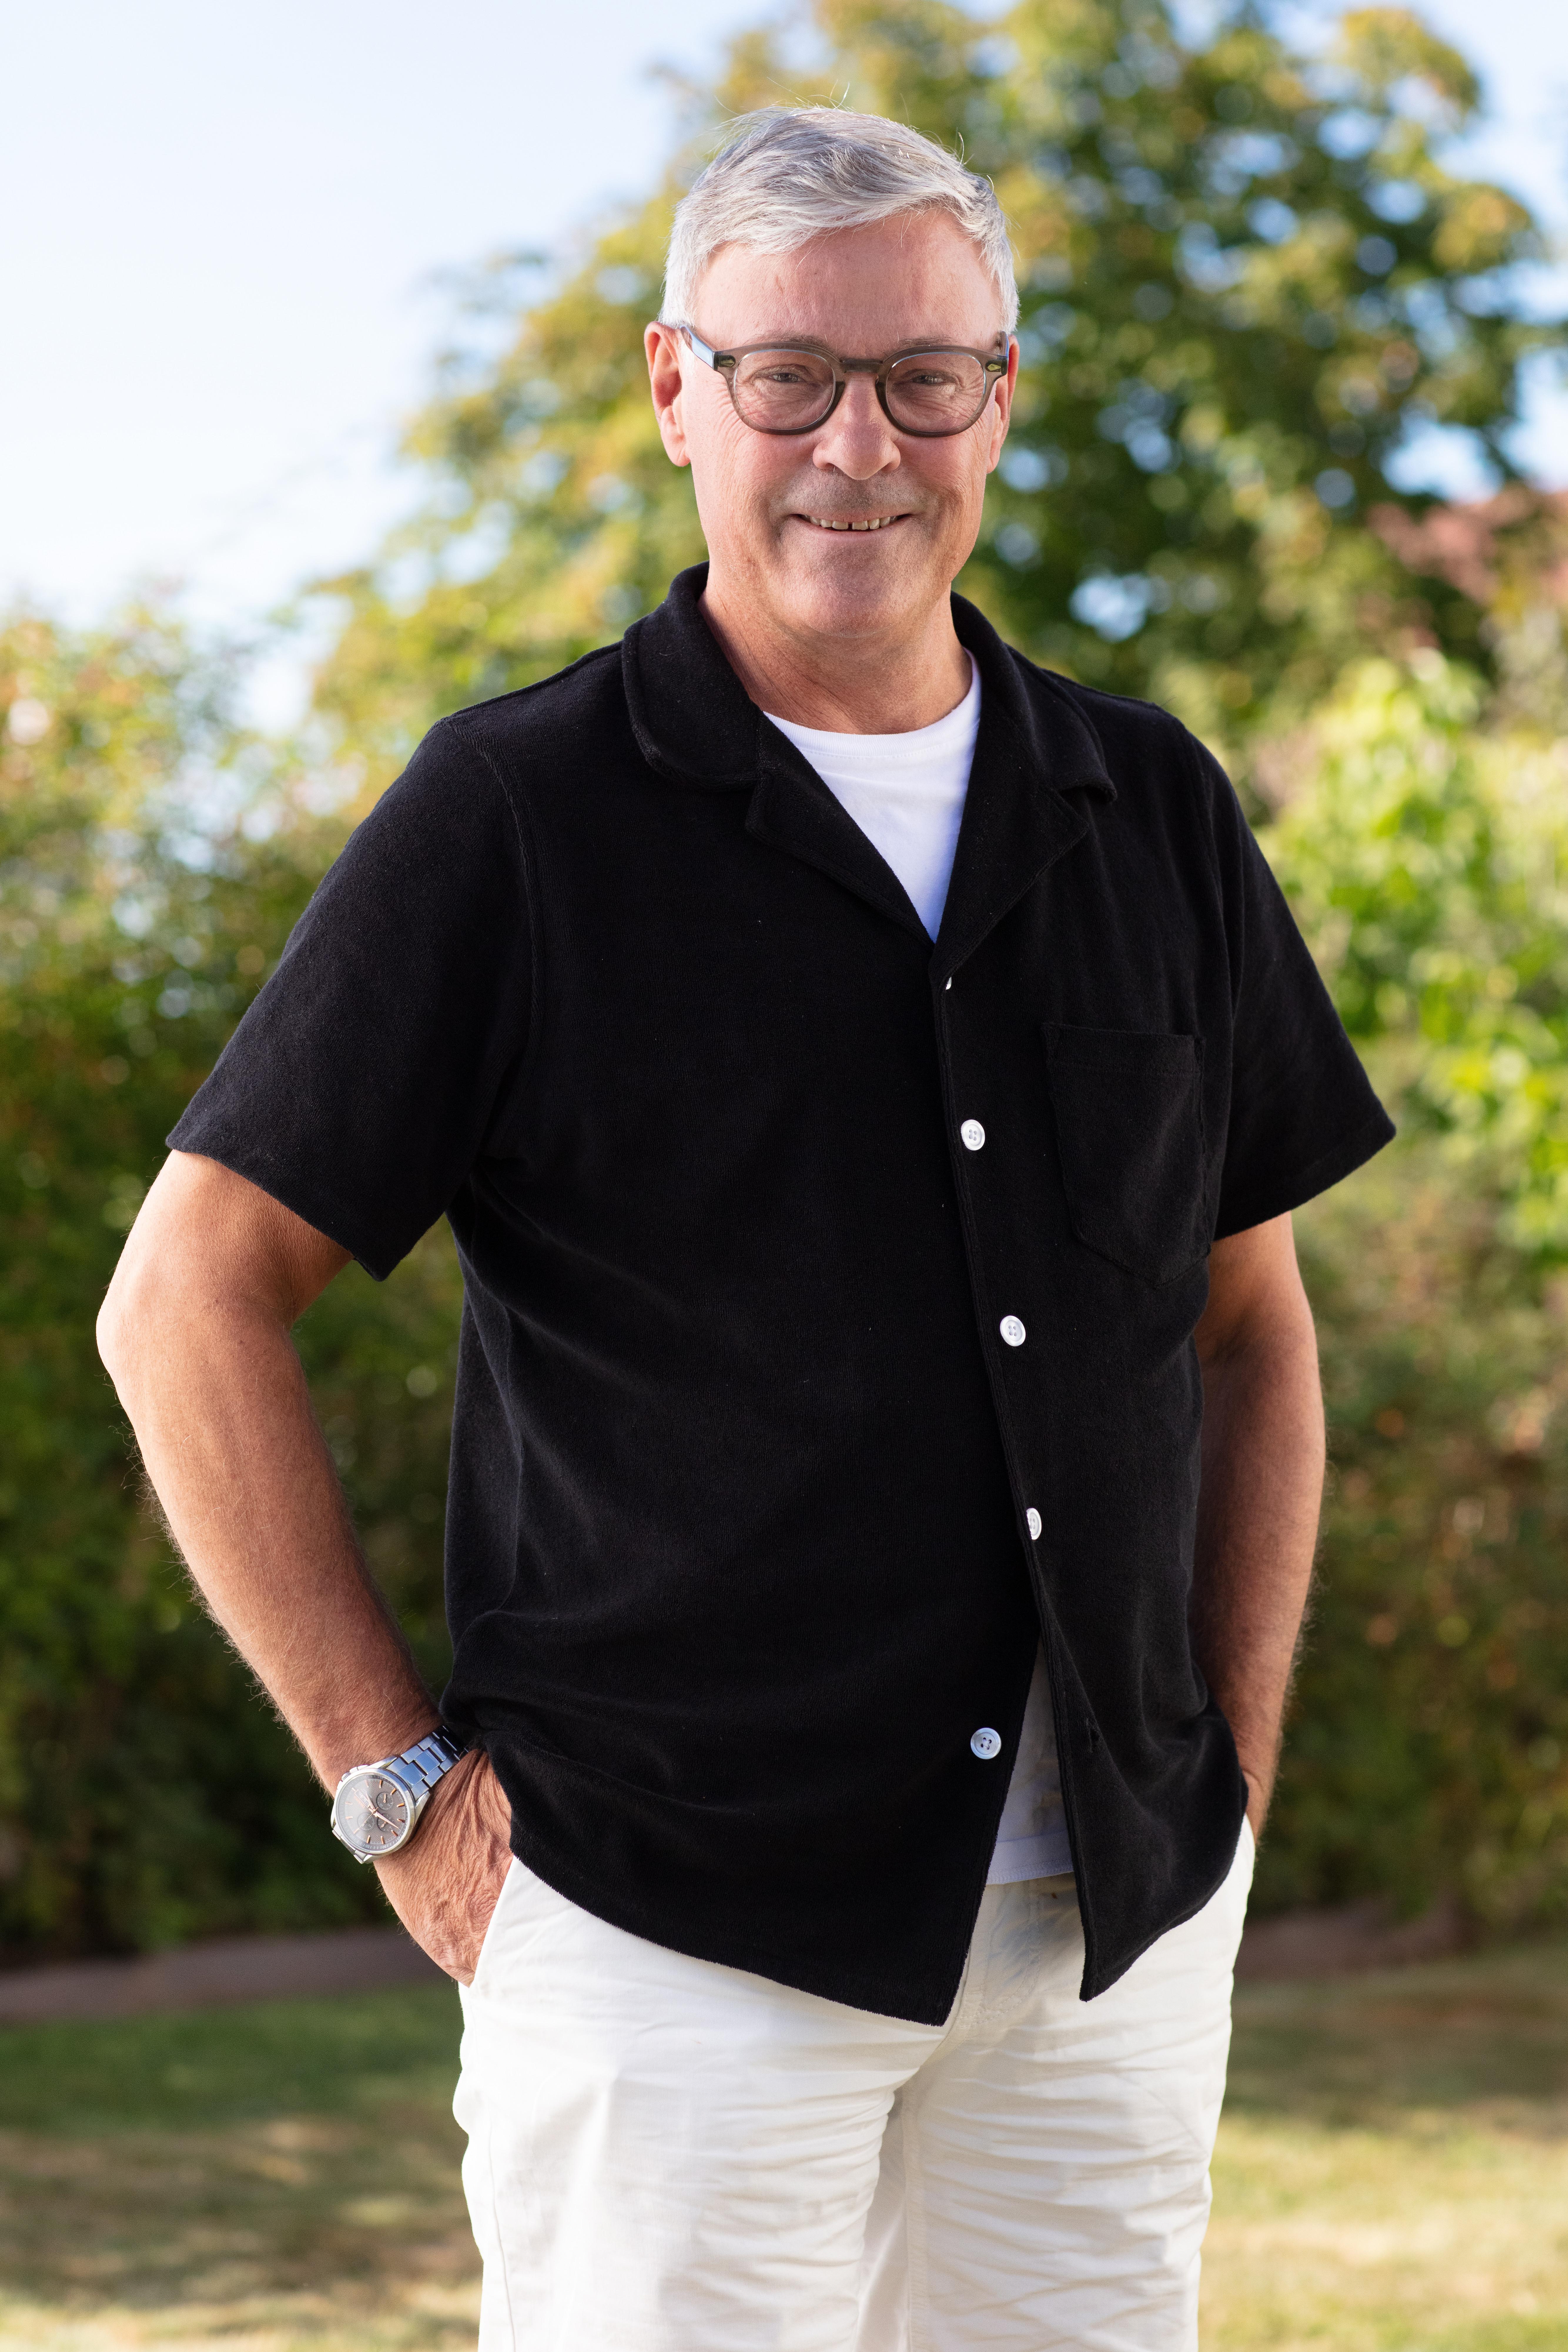 John Kihlbom